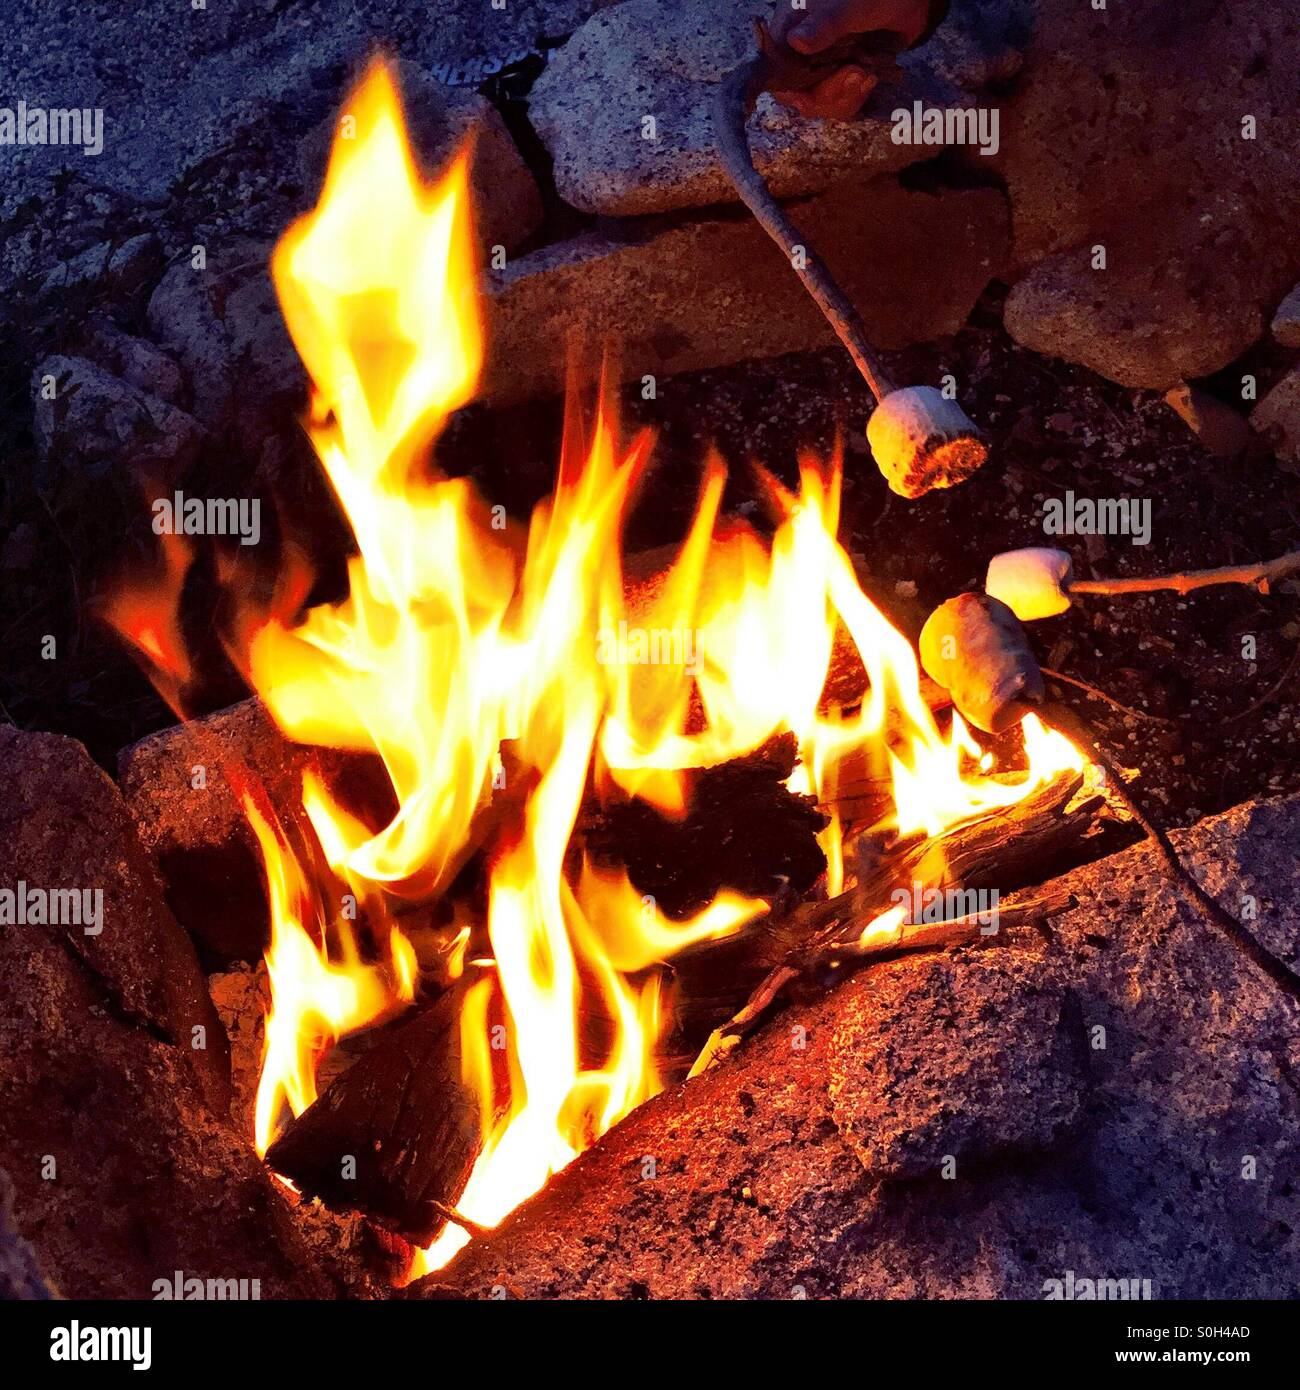 Roasting Marshmallows Over An Open Campfire